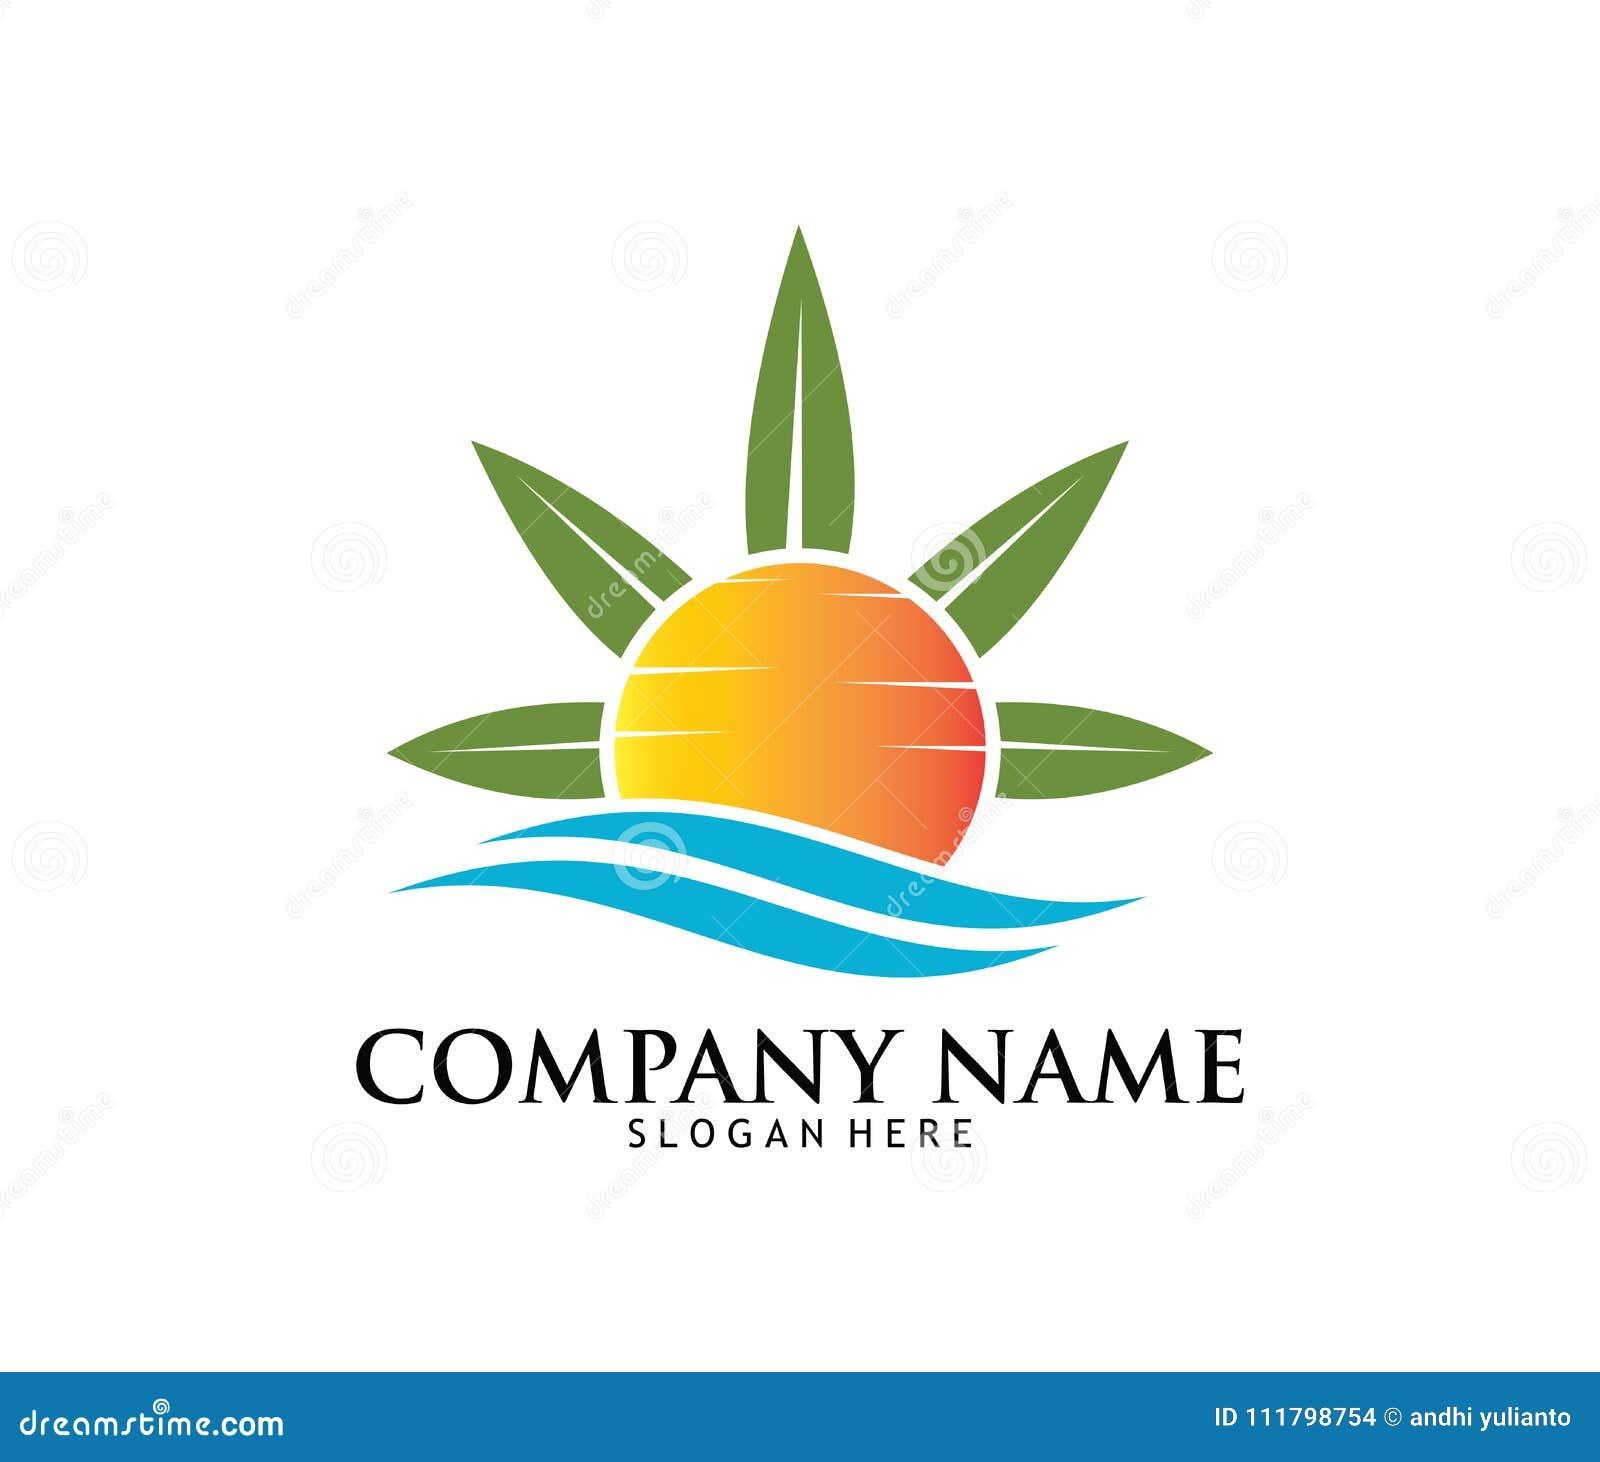 Медицинский дизайн логотипа лаборатории фармации лекарства конопли марихуаны